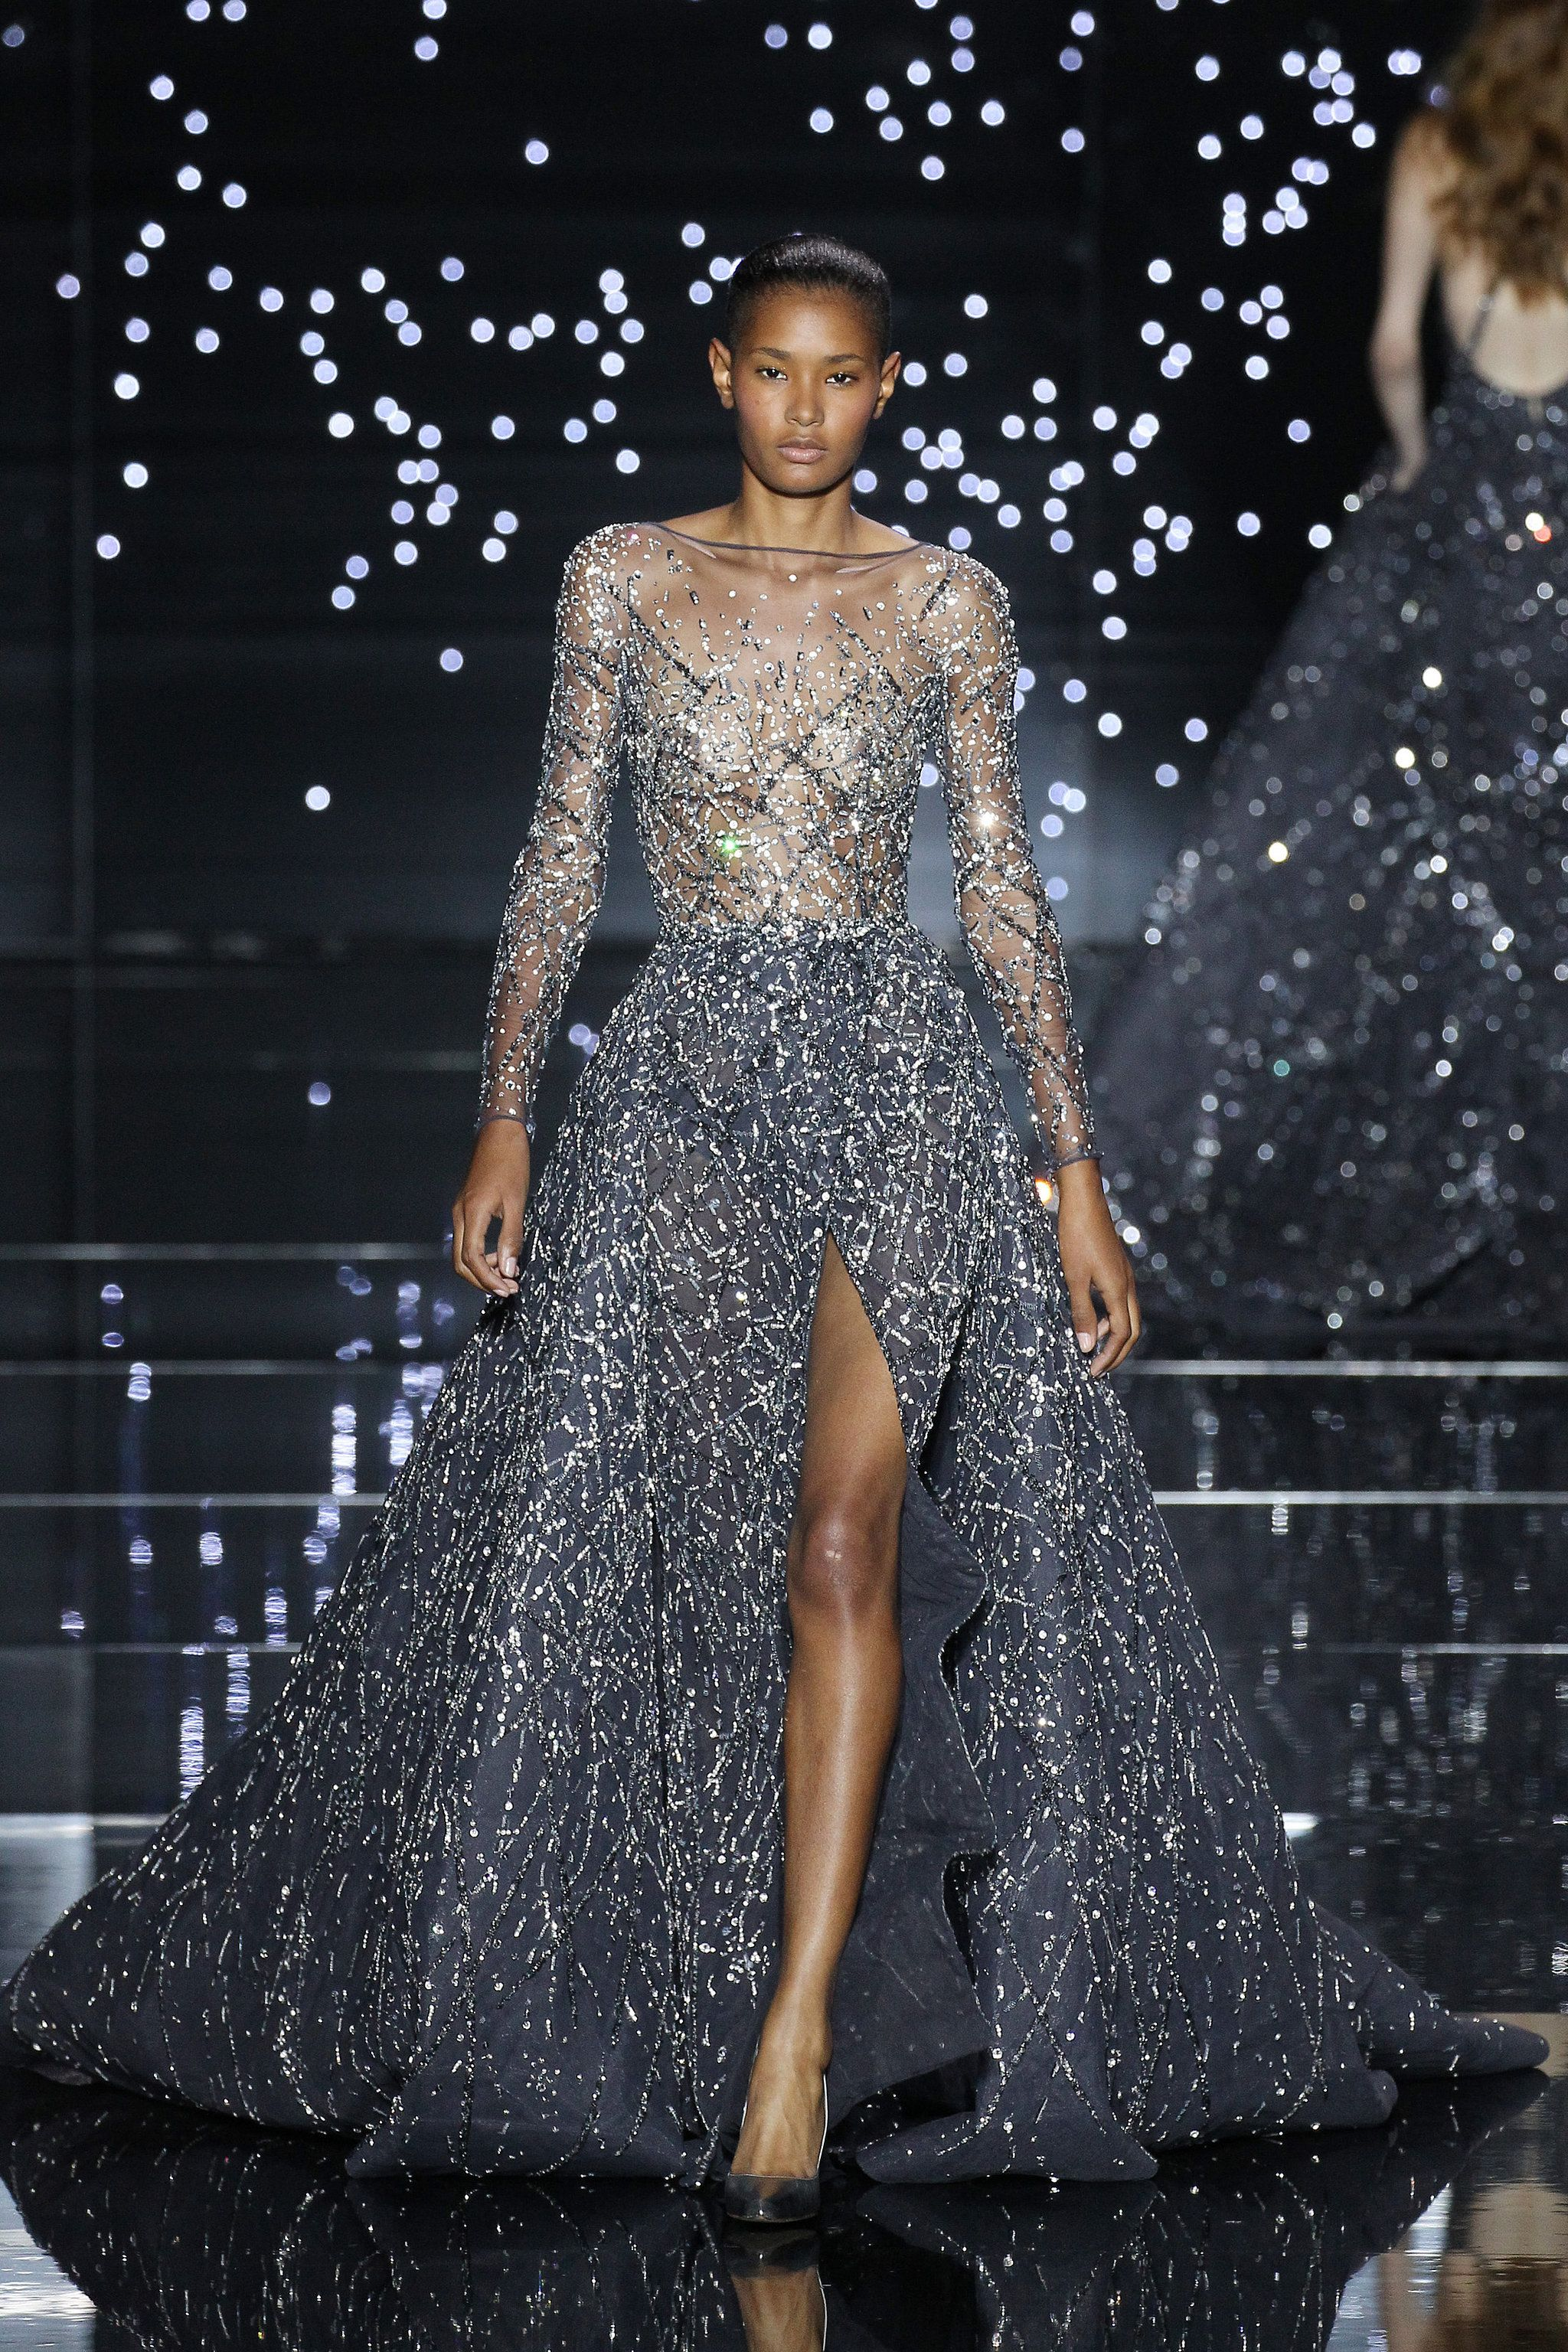 Zuhair Murad  Zuhair murad haute couture, Fashion week dresses